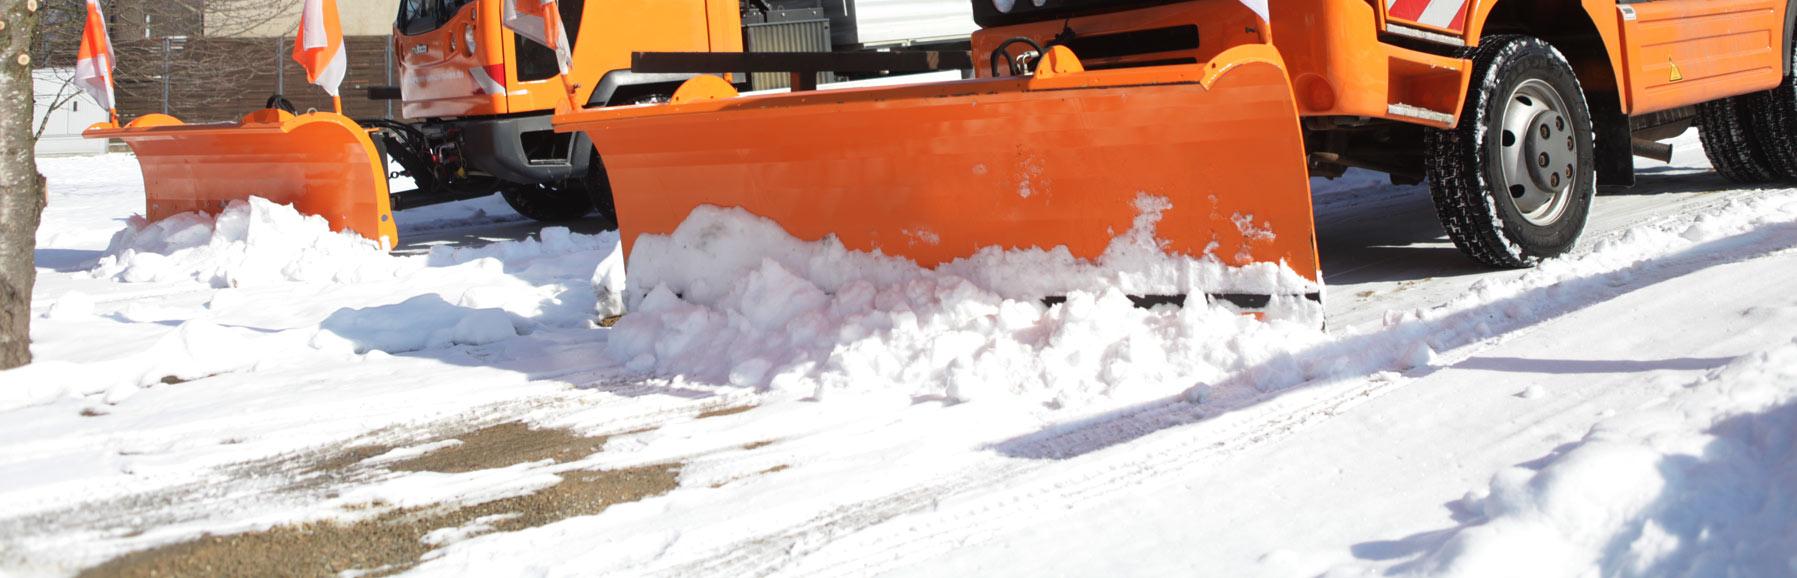 Winterdienstangebot Cottbus